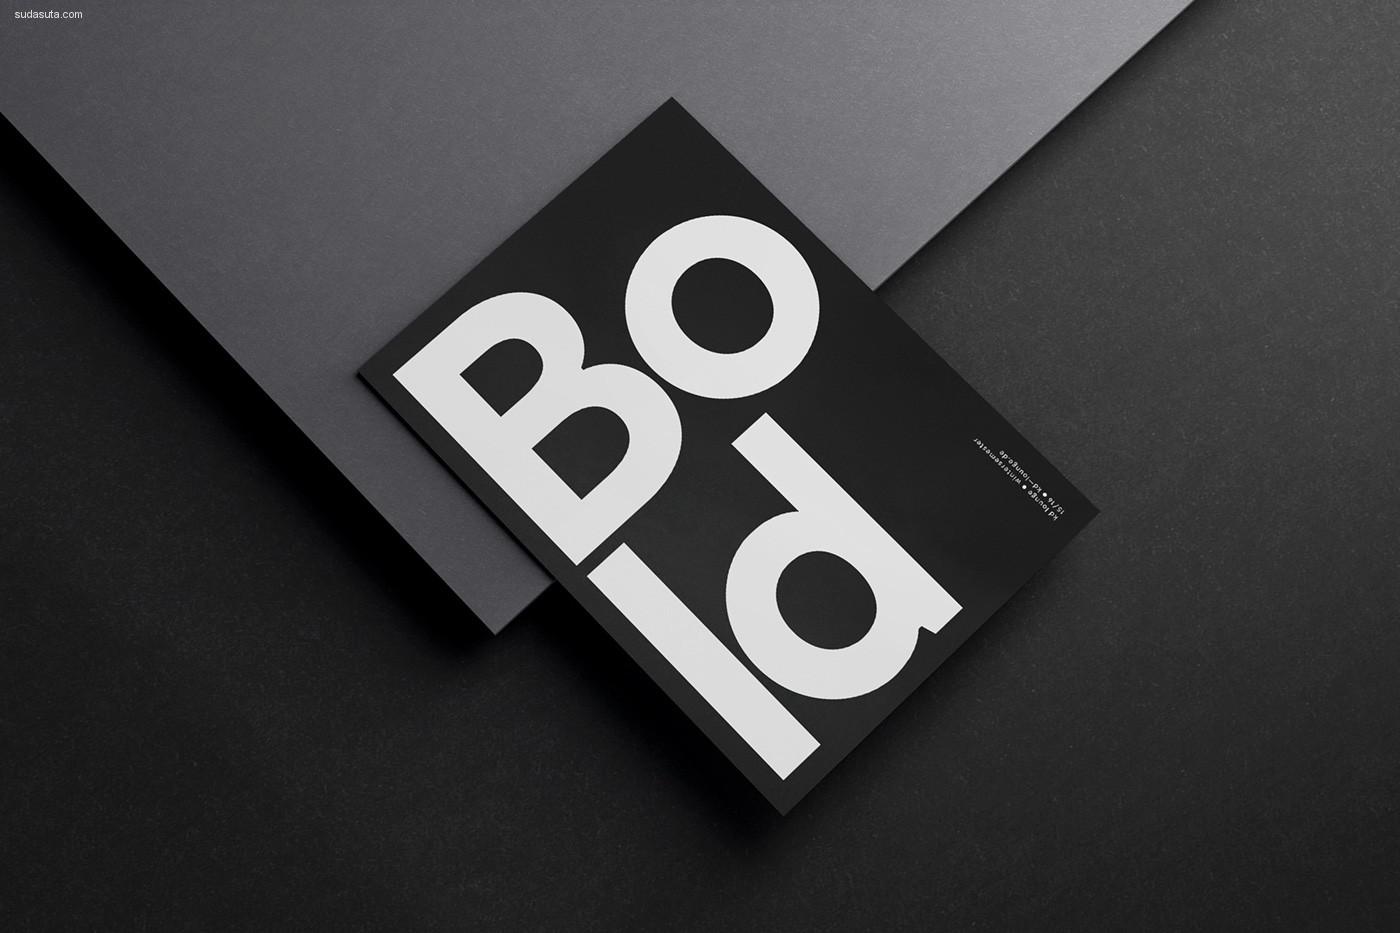 Fabian Fohrer 极简主义黑白平面构成欣赏